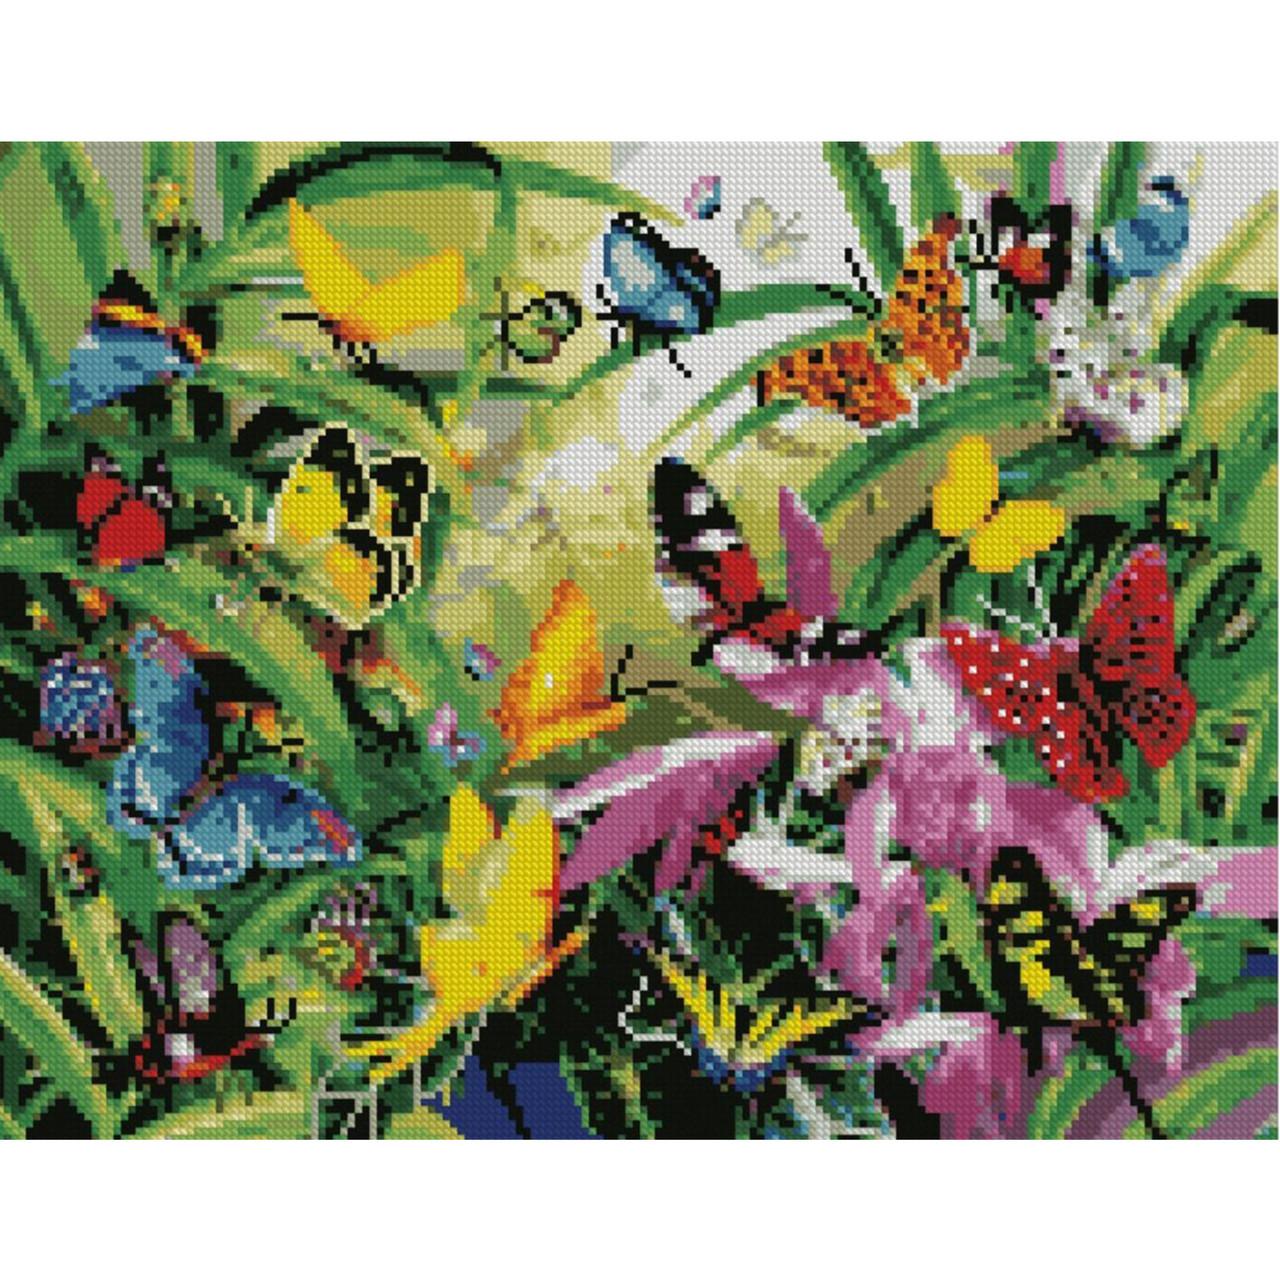 Алмазная вышивка 40x50 см. Бабочки на летний поляне Strateg в подарочной коробке